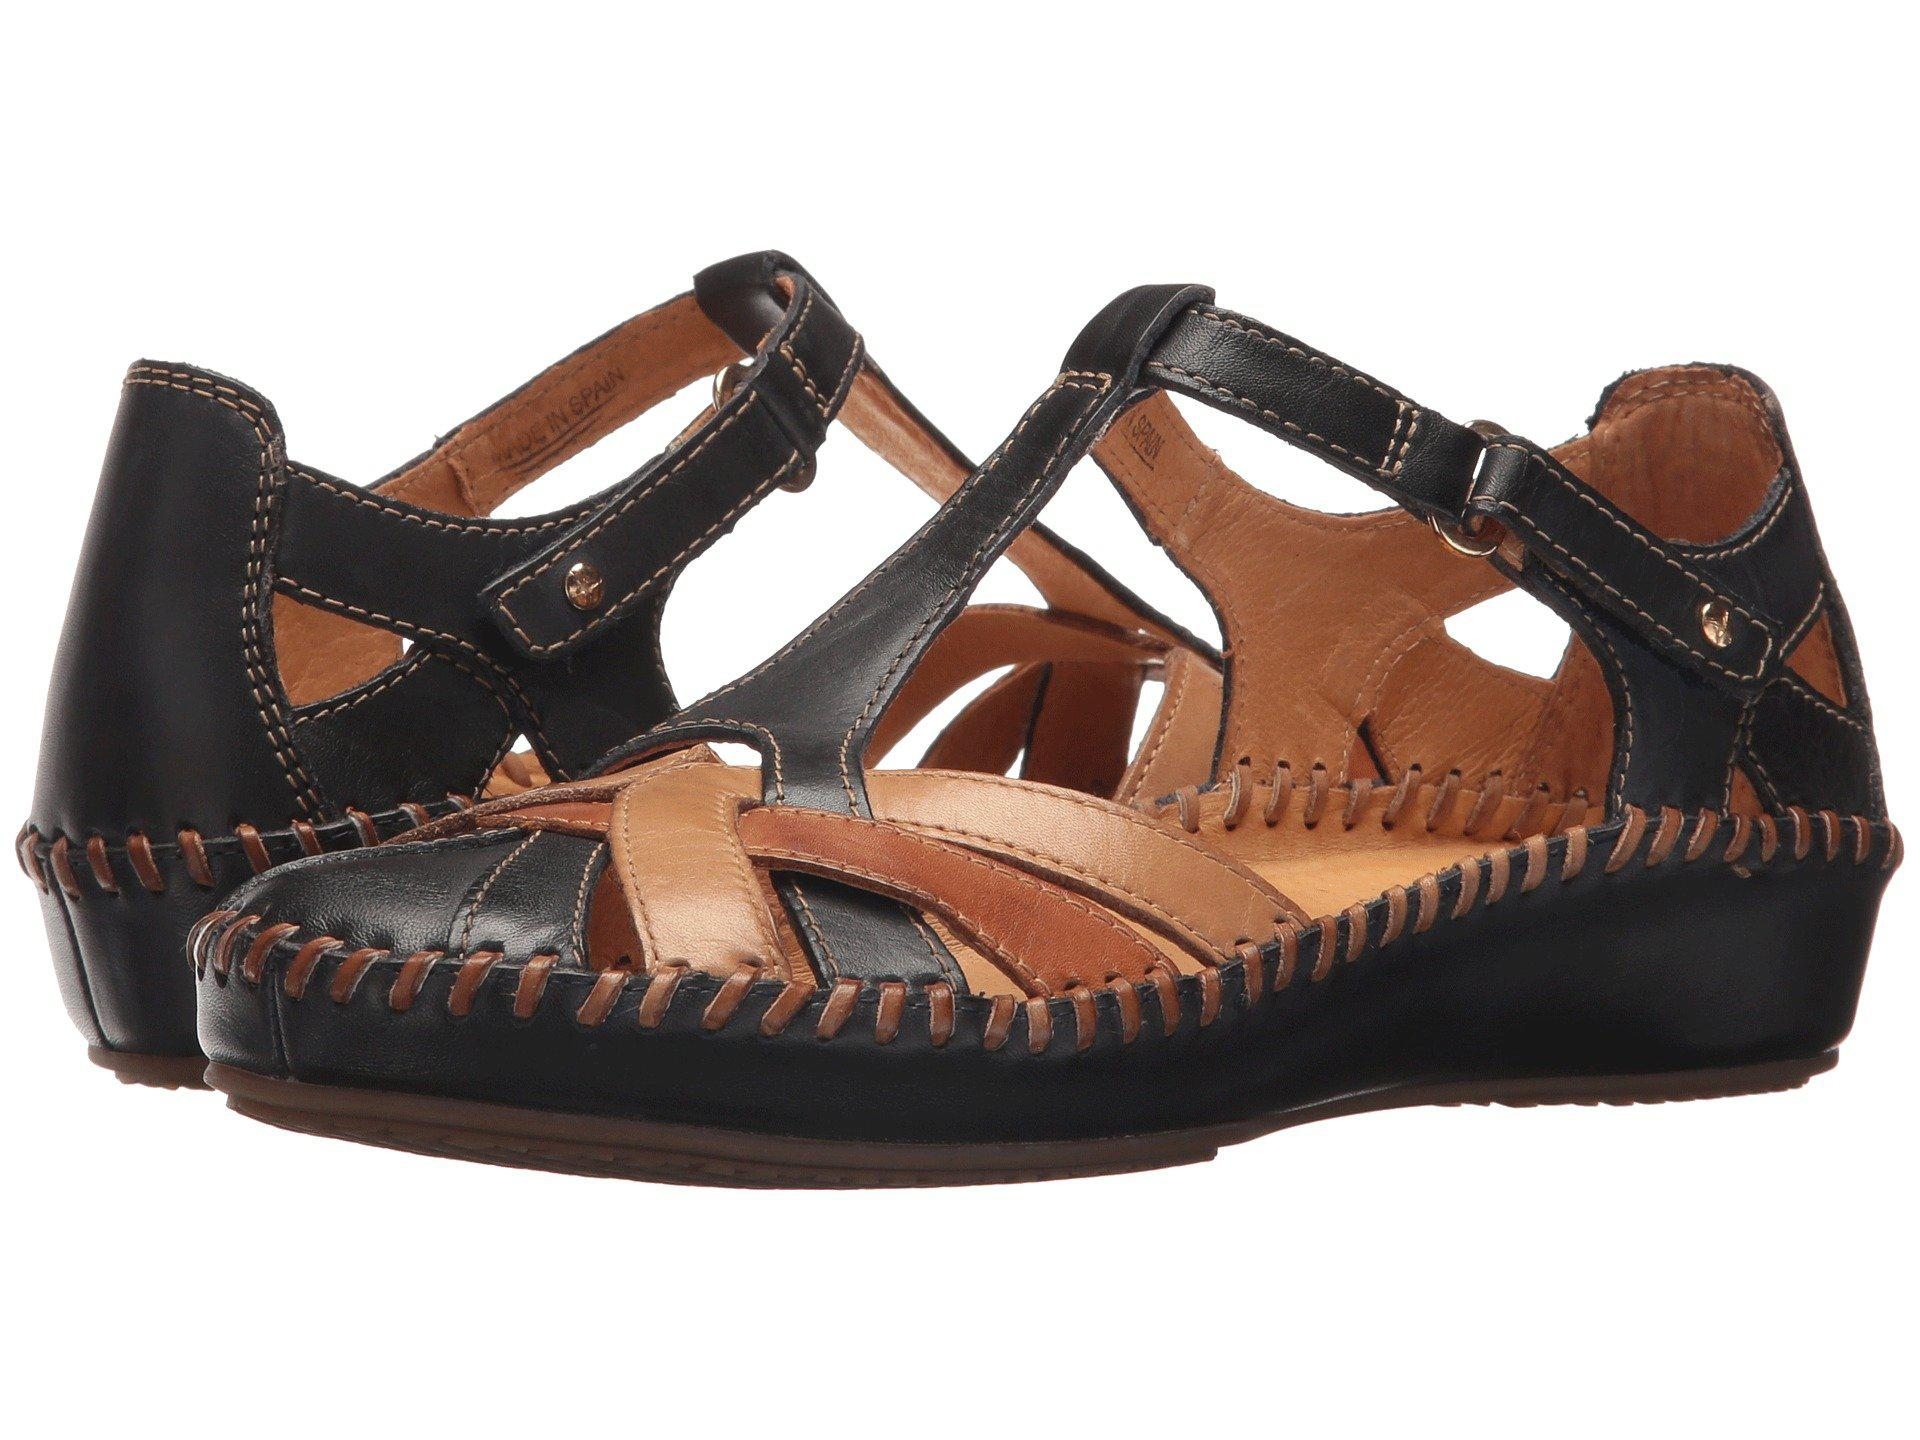 61a9edffe Pikolinos Puerto Vallarta 655-0732c5 (navy Blue) Women's Sandals in ...